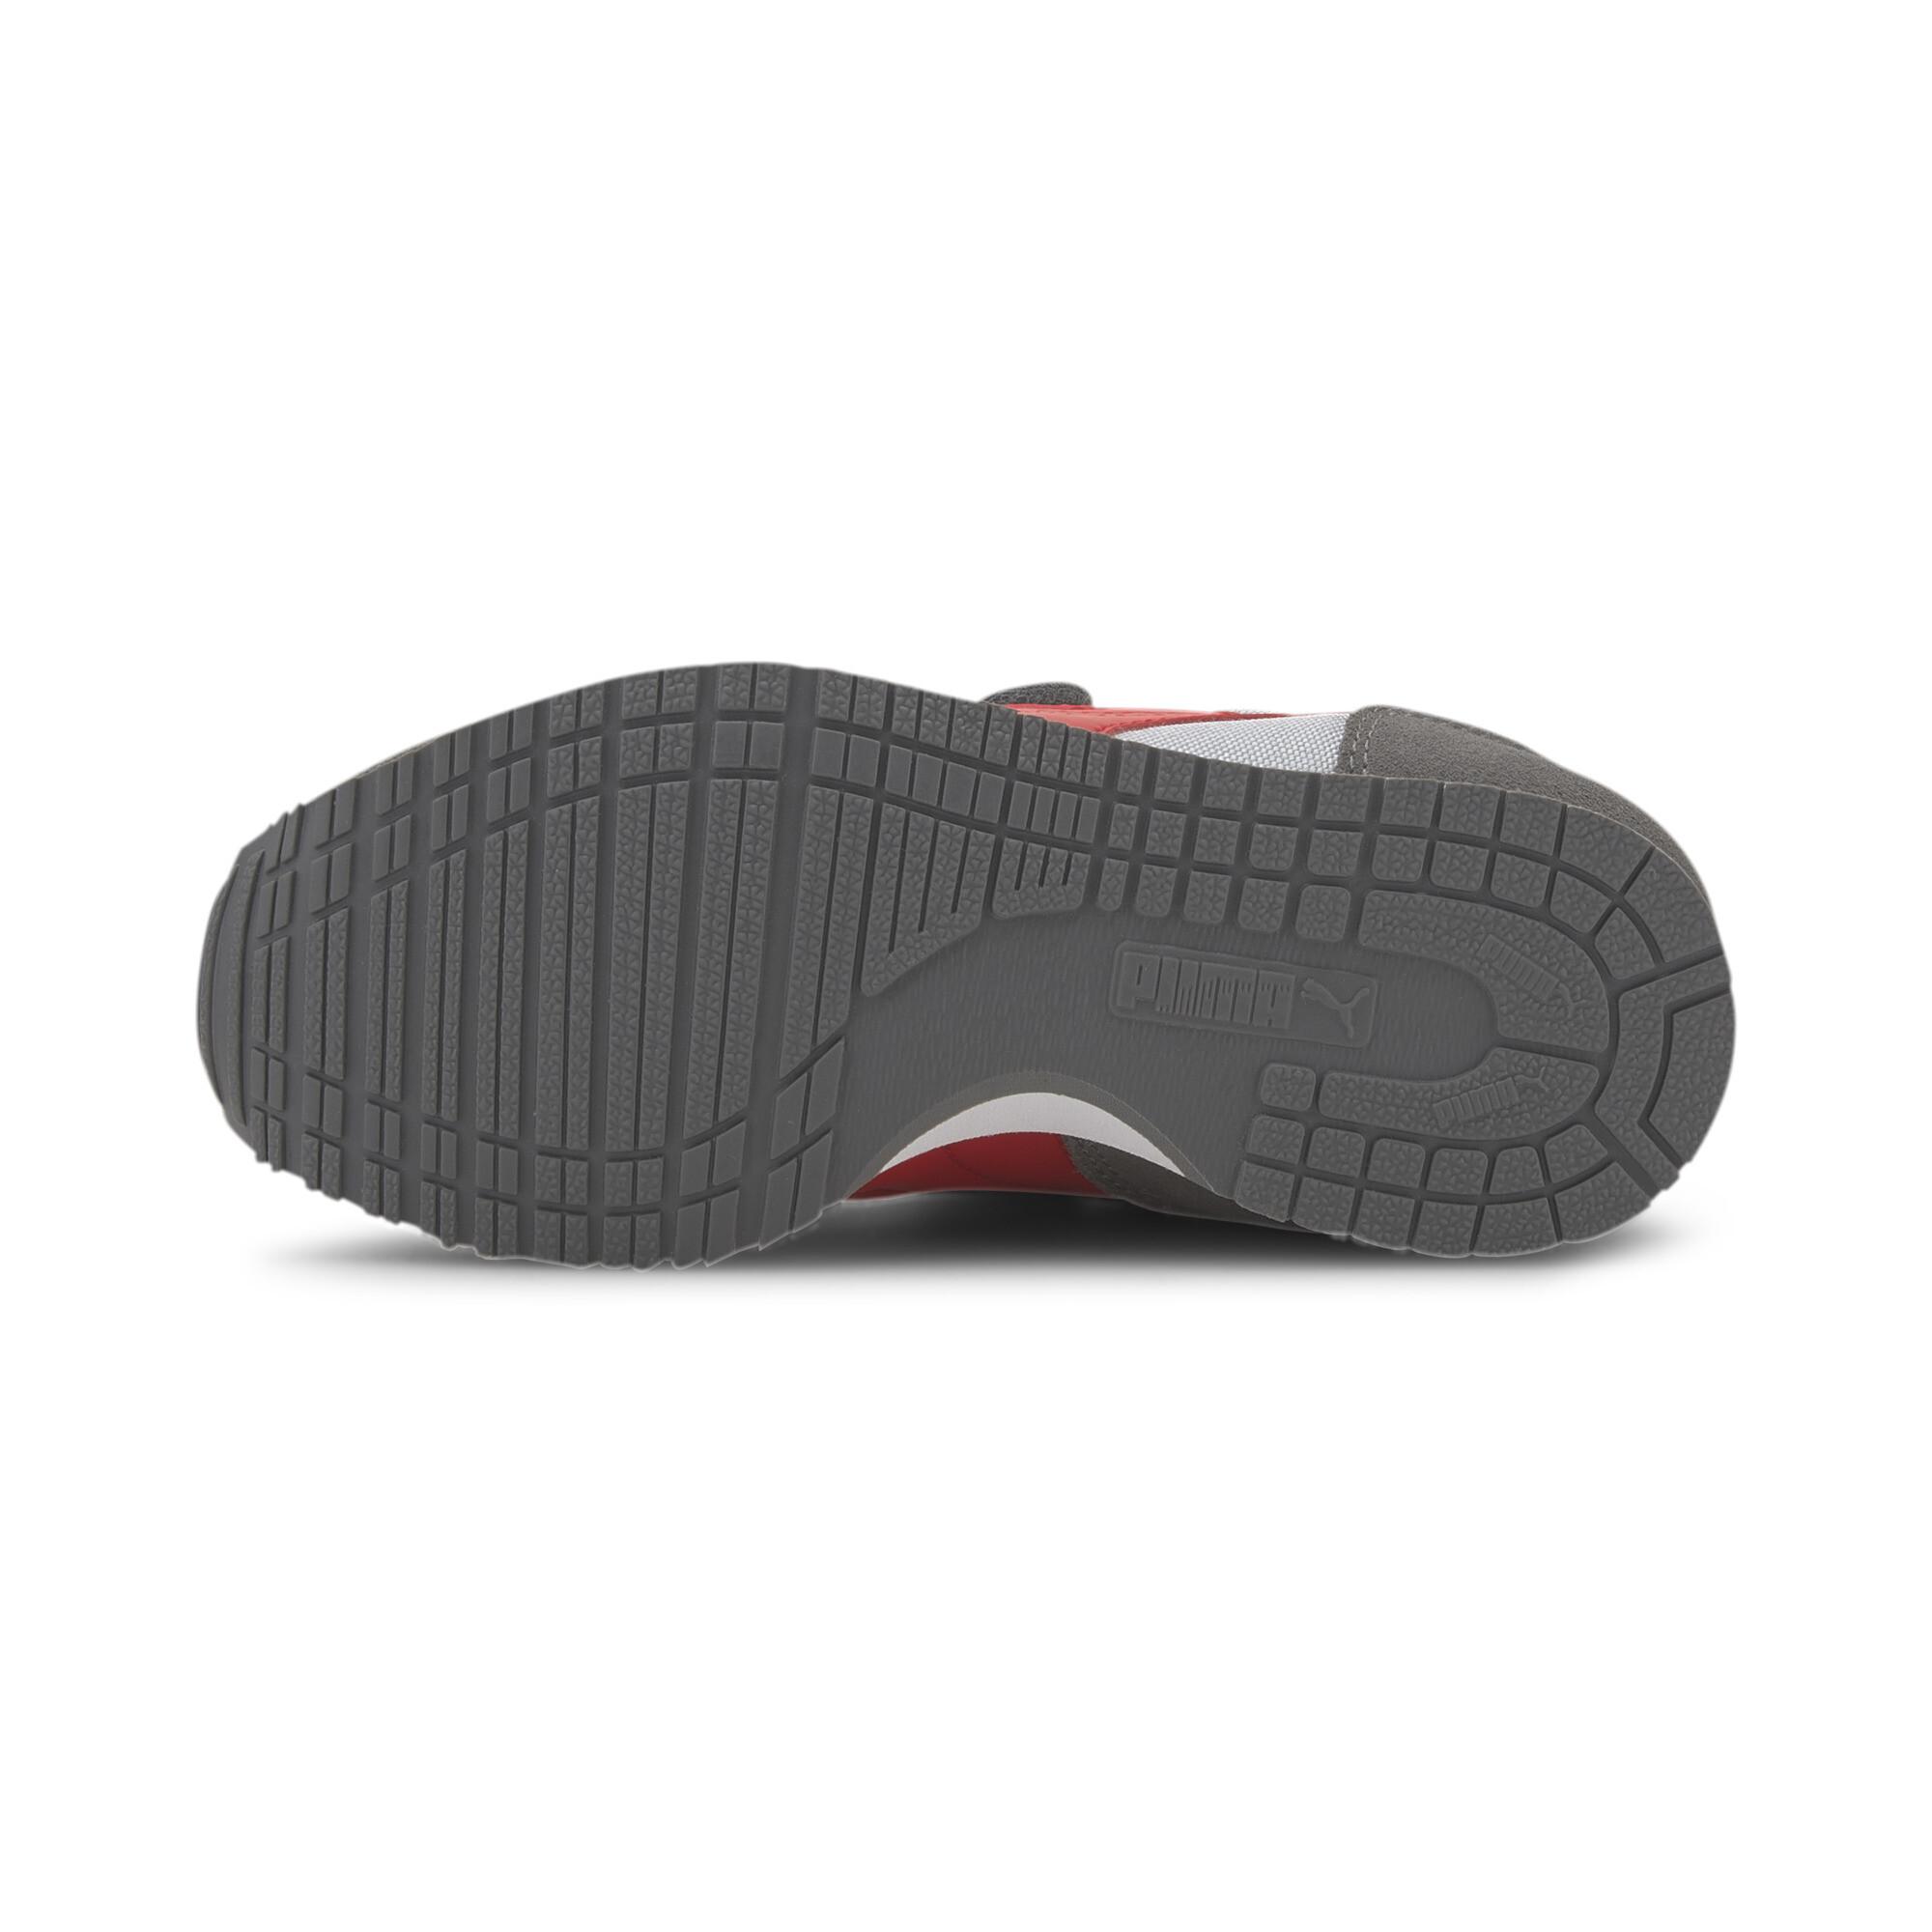 PUMA-Cabana-Racer-Little-Kids-039-Shoes-Kids-Shoe-Kids thumbnail 28